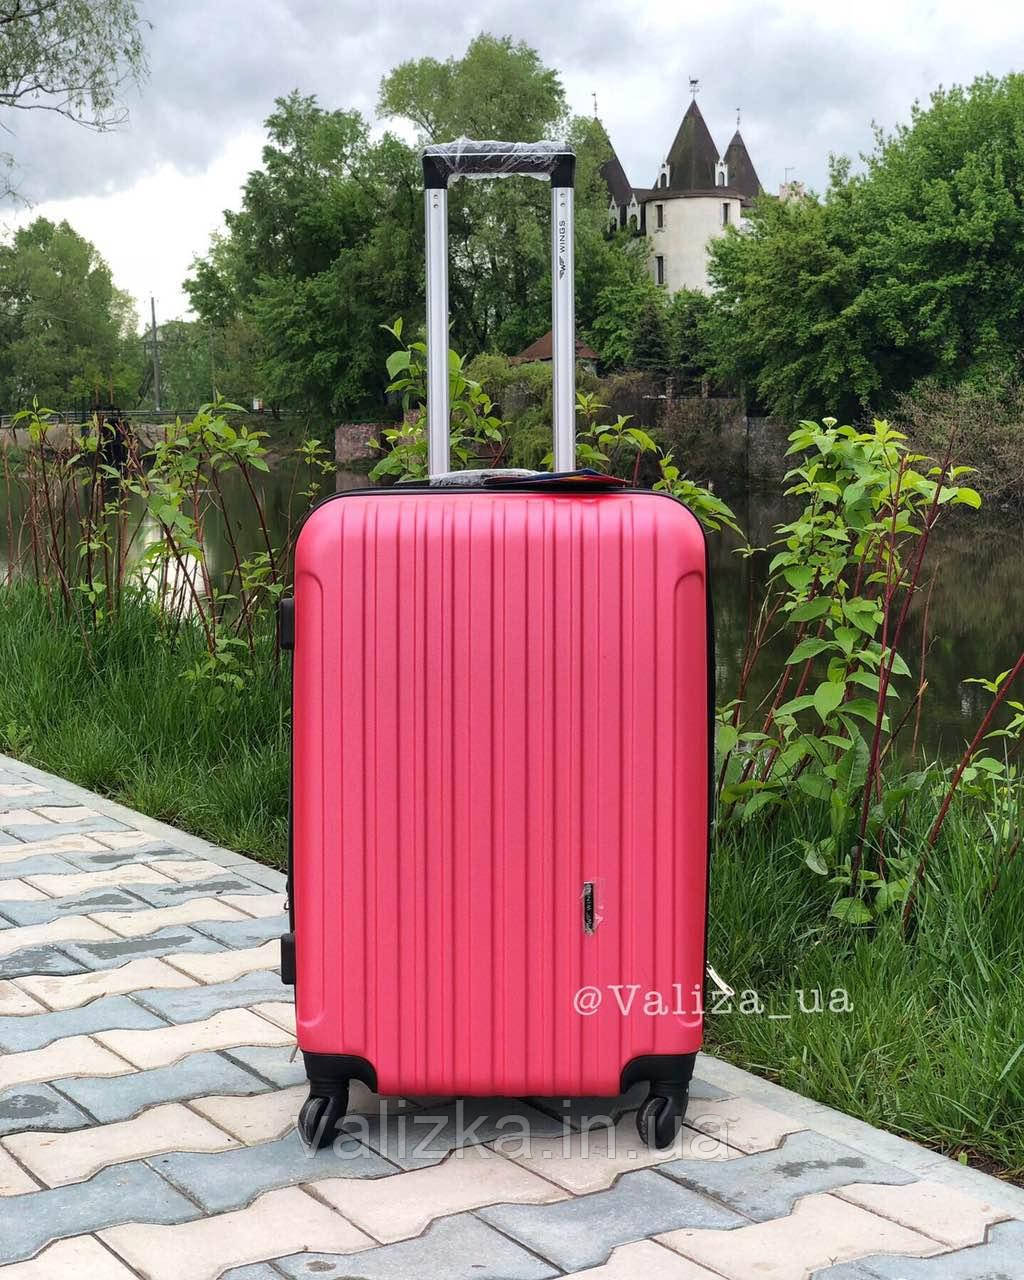 Чемодан из поликарбоната средний чемодан розовый с расширителемПольша / Валіза середня з полікарбонату